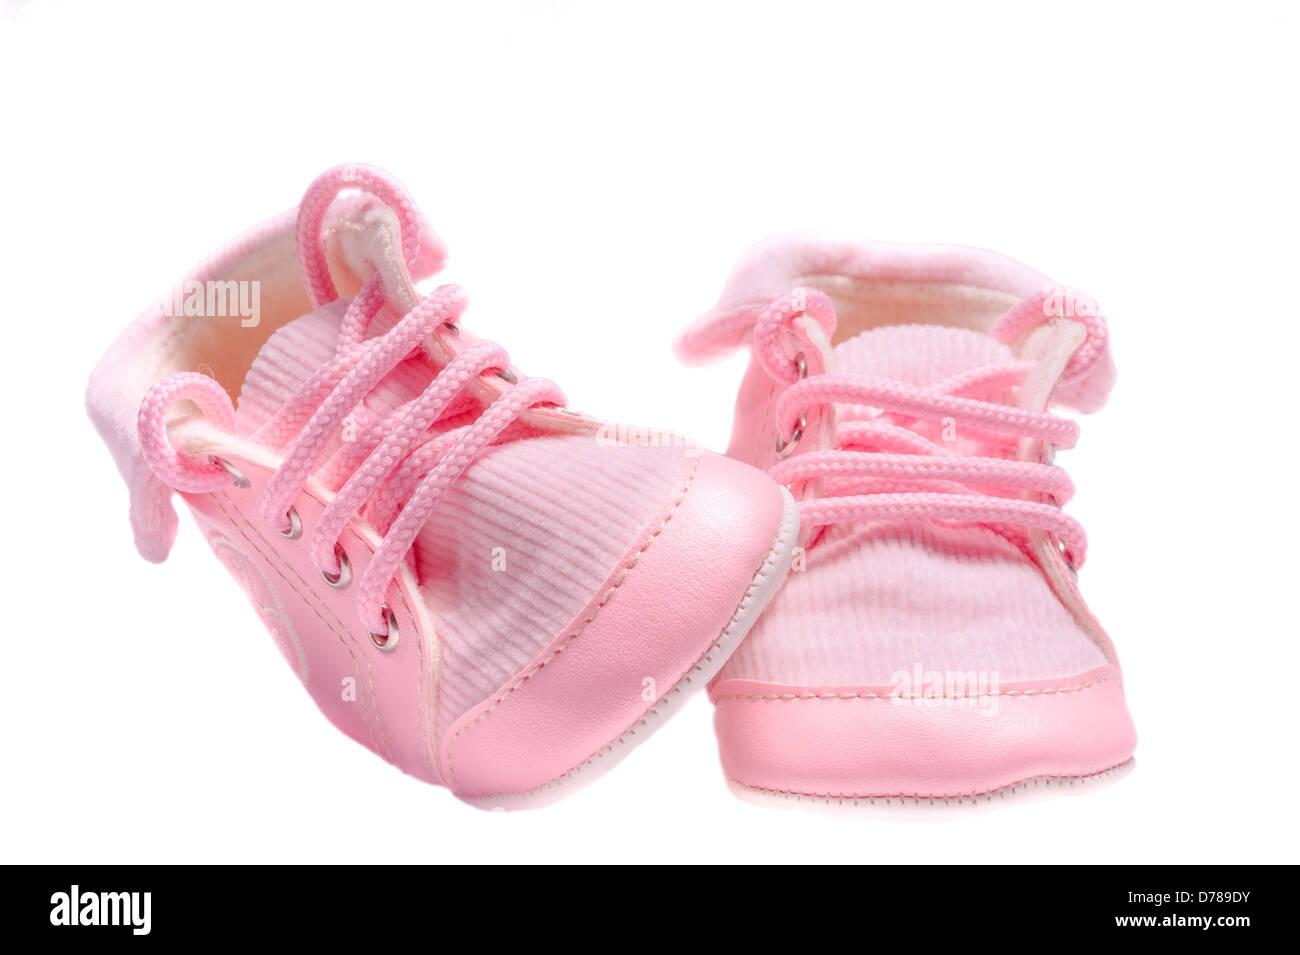 pink velvety baby shoes Isolated on white background - Stock Image